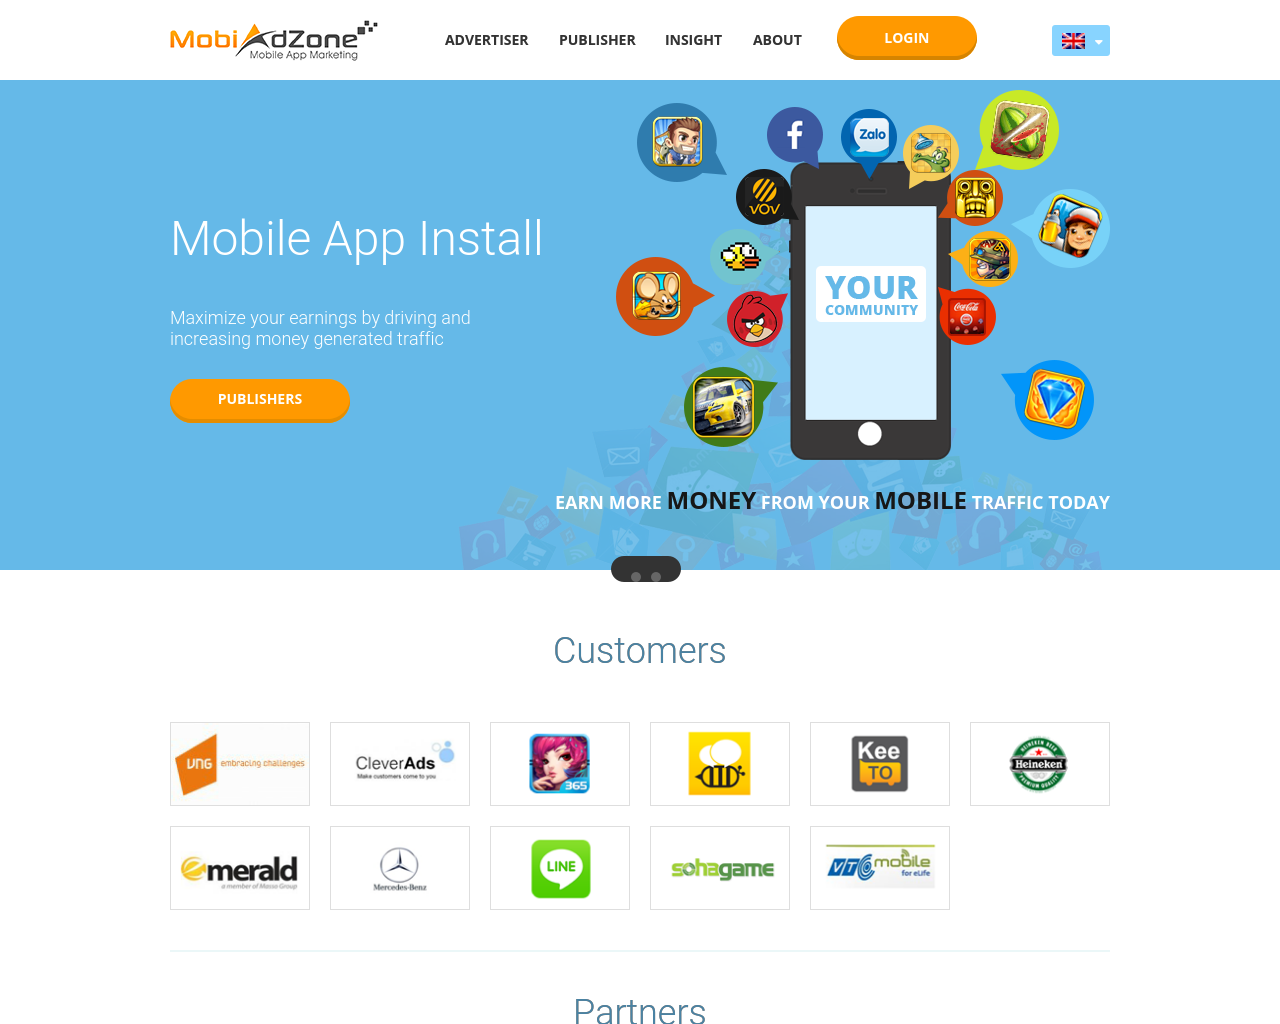 Mobi-Adzone-Advertising-Reviews-Pricing